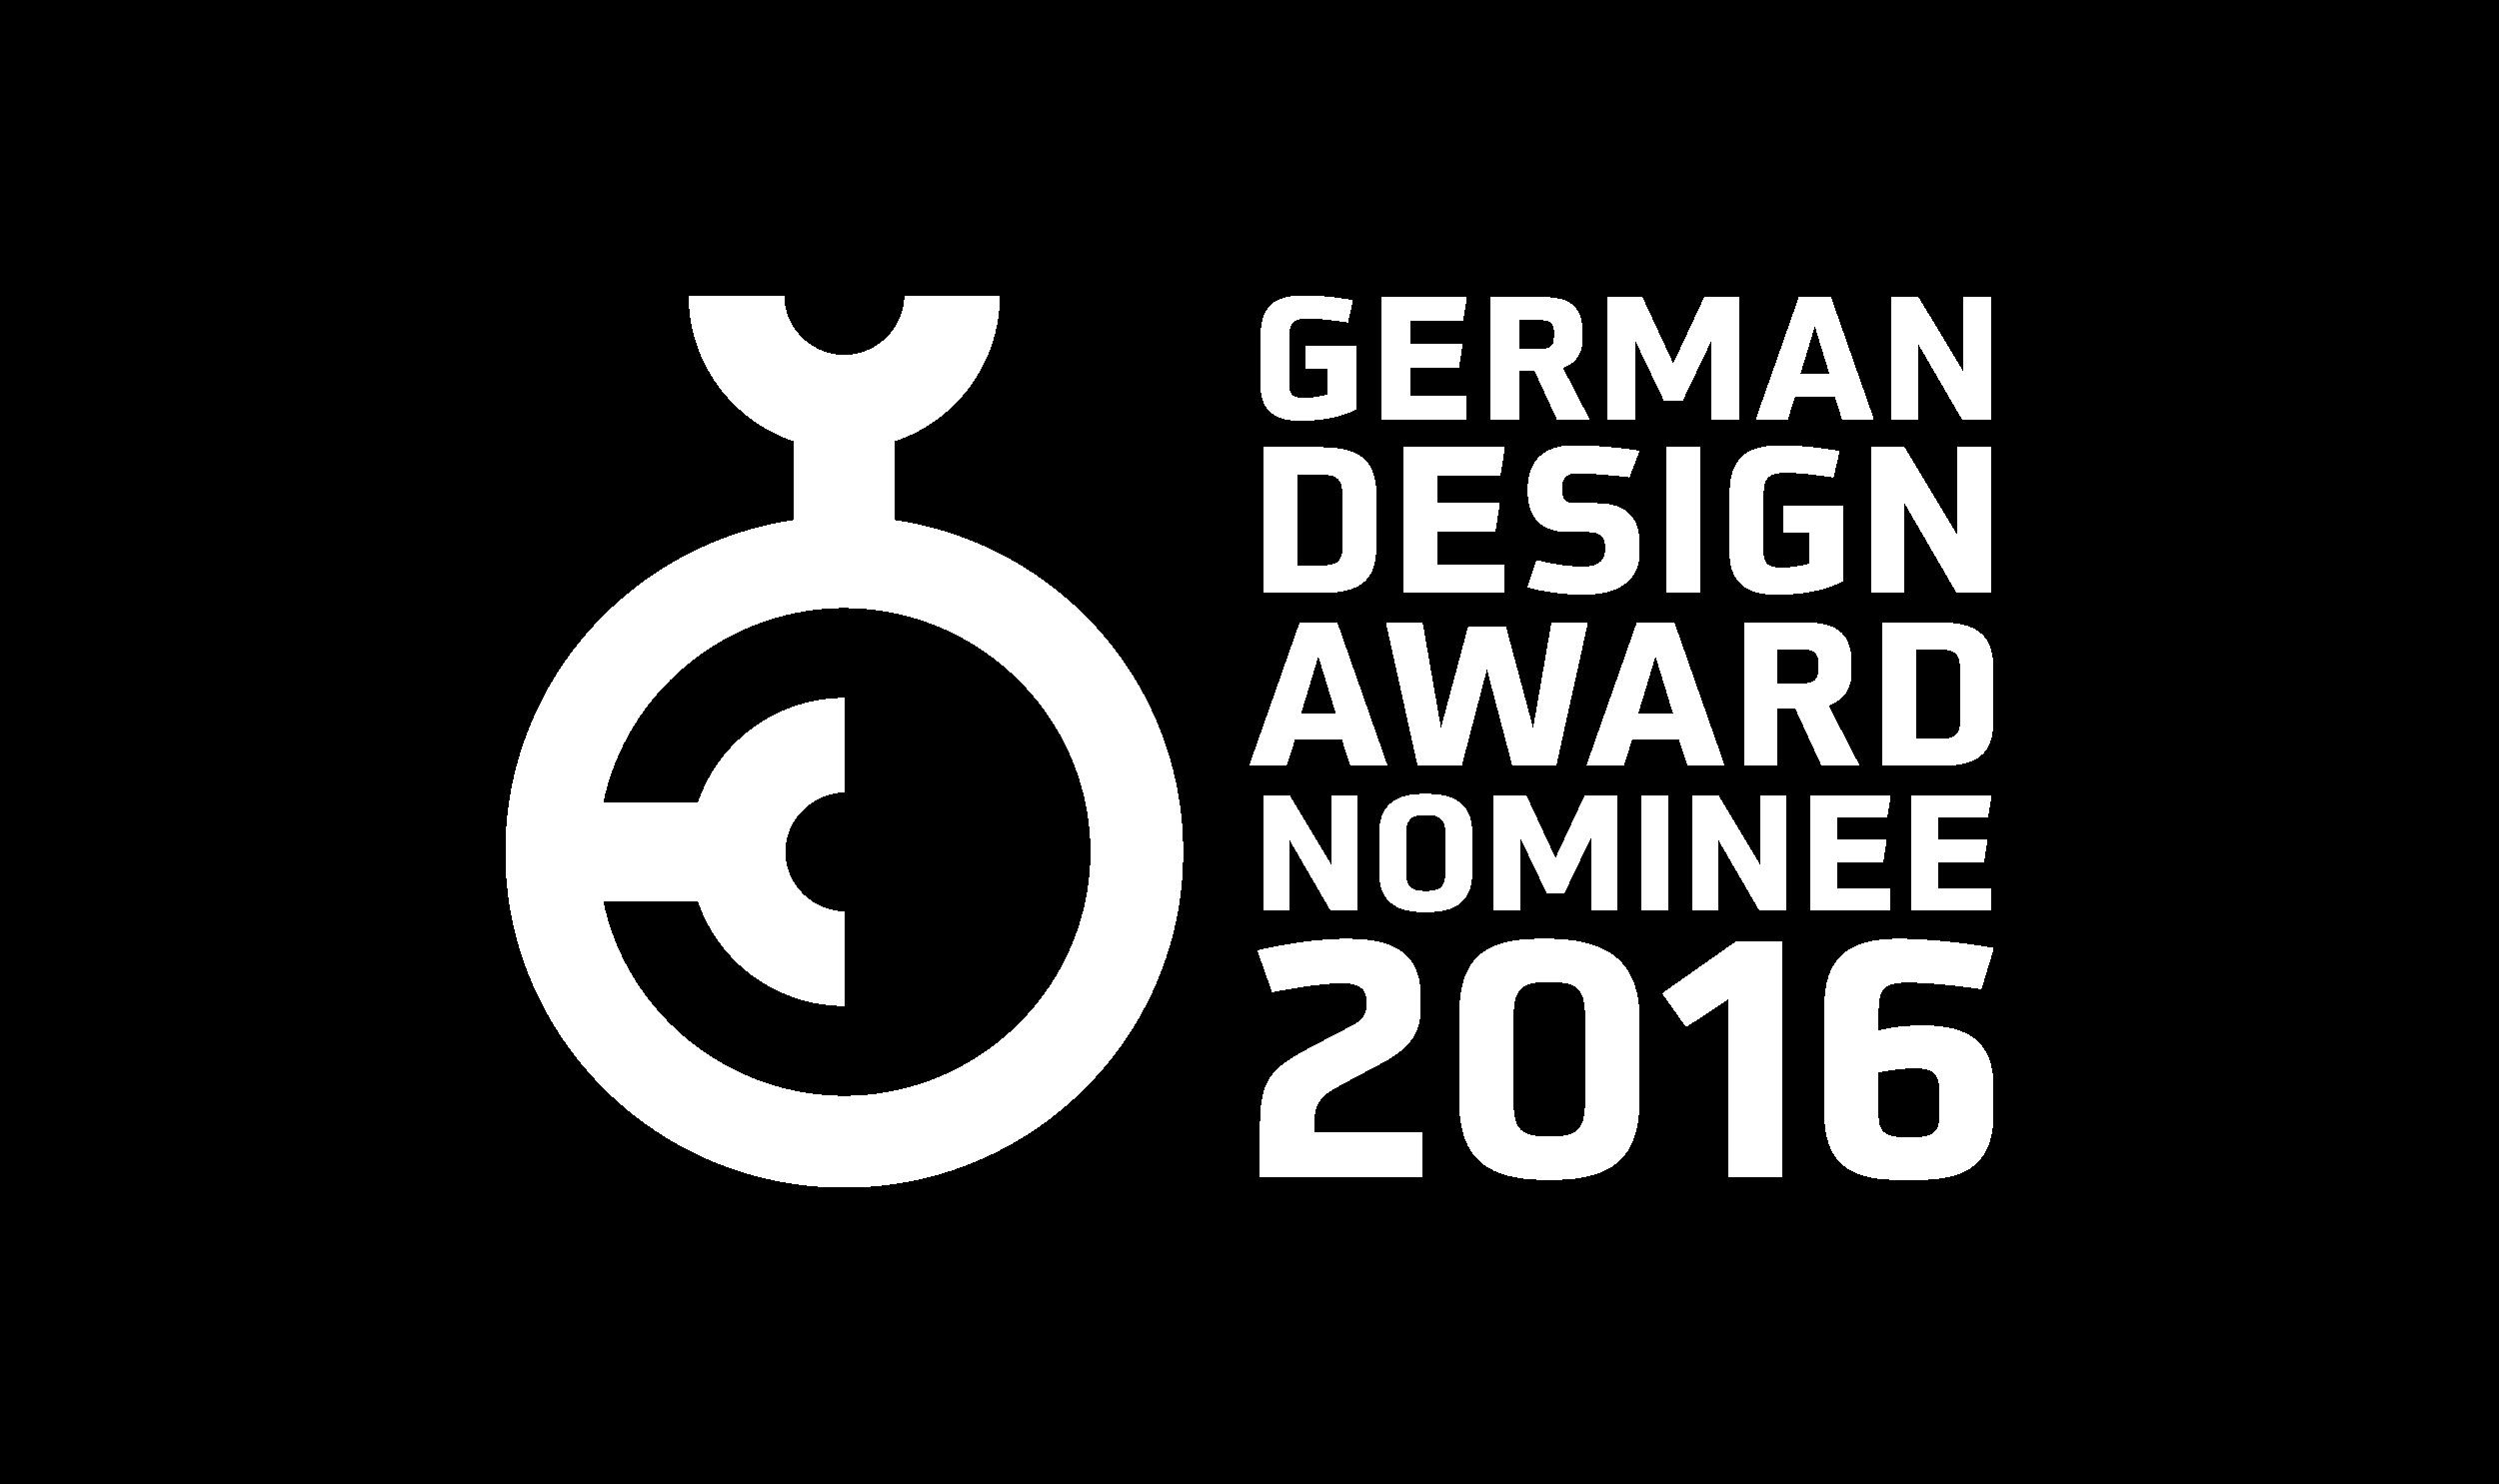 German_Design_Award_Nominee_2016